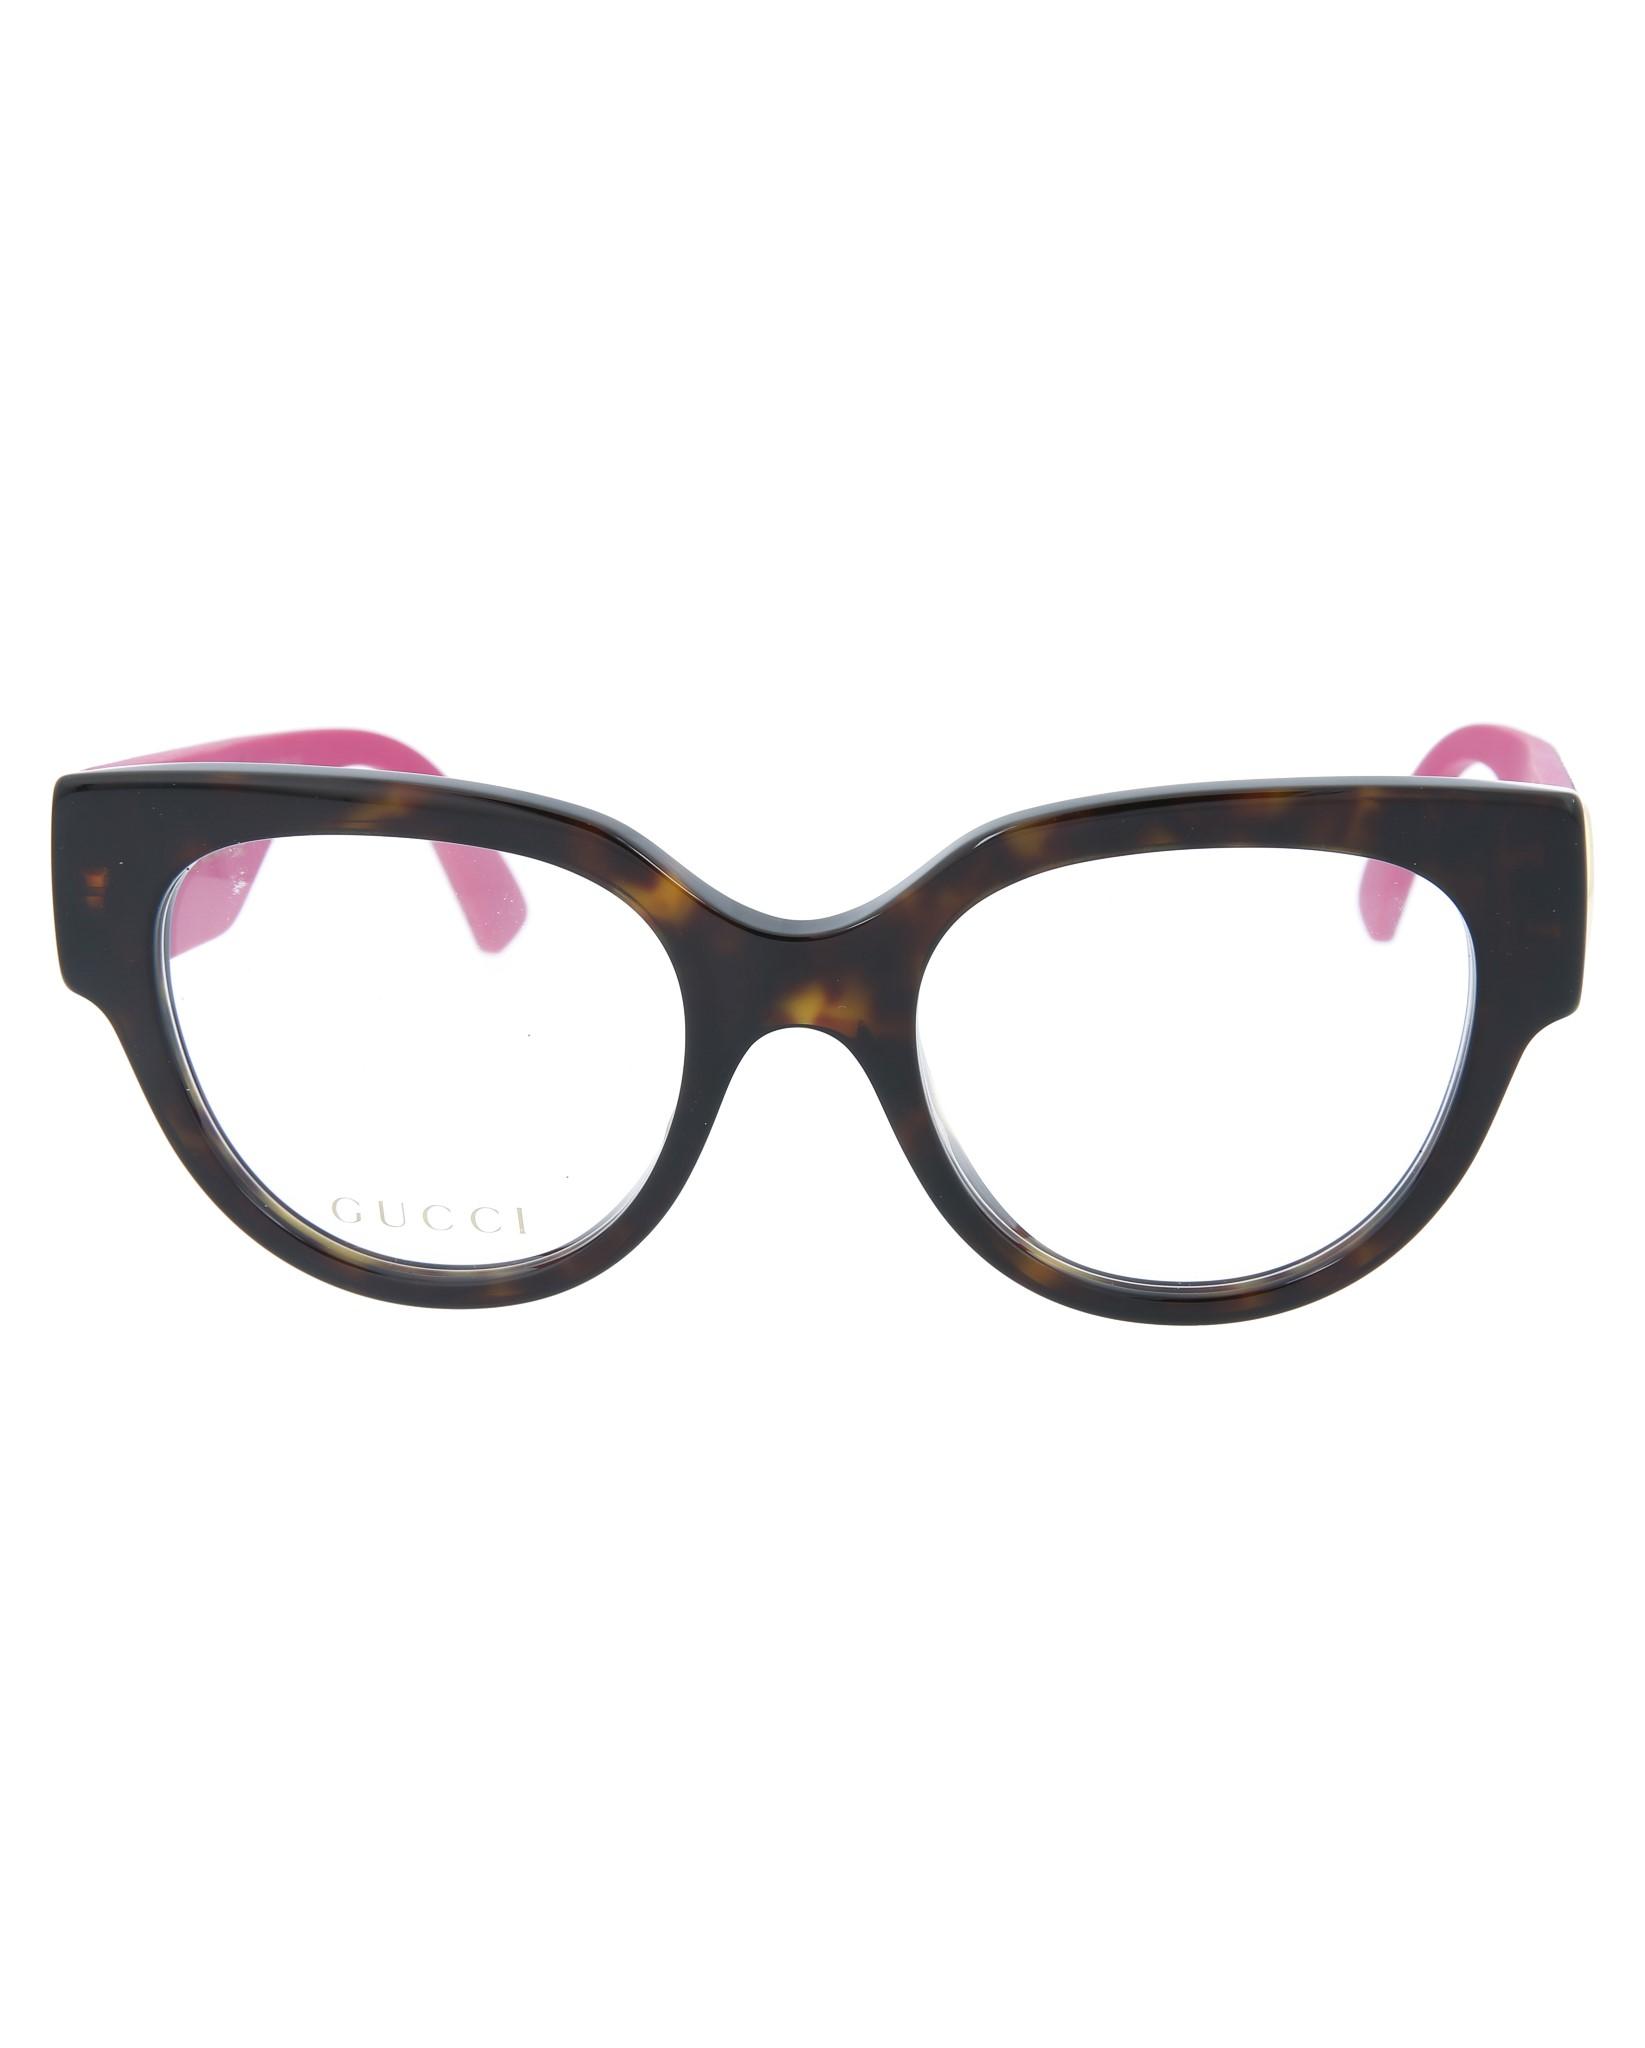 656c4f882b2 Gucci Womens Cat Eye Optical Frames GG0103O-30001539-003 ...